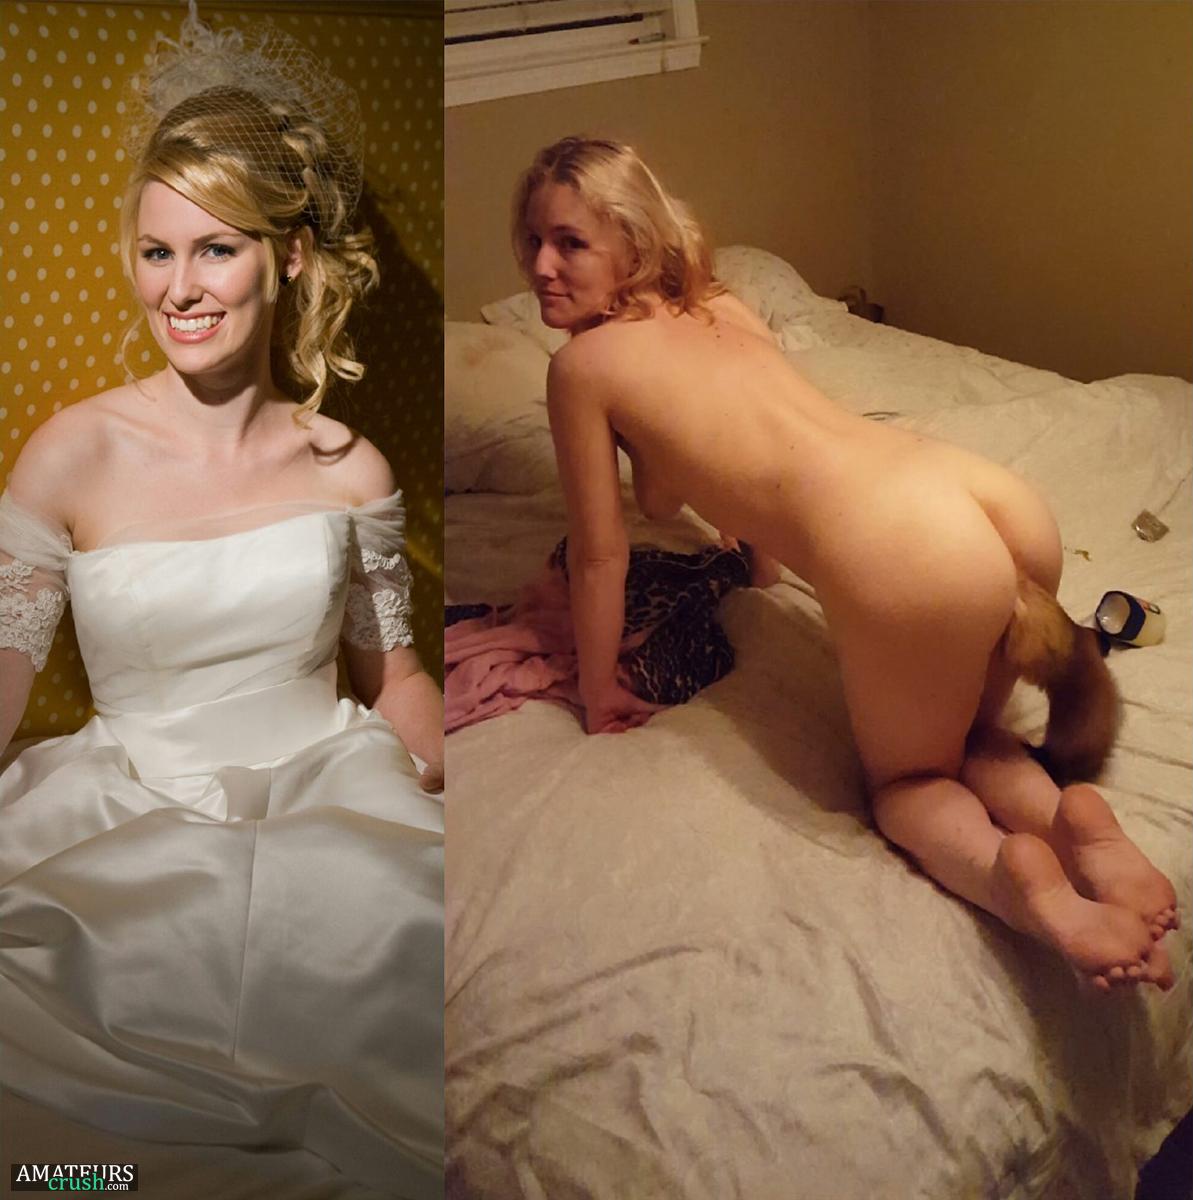 my girlfriend bending over naked pics